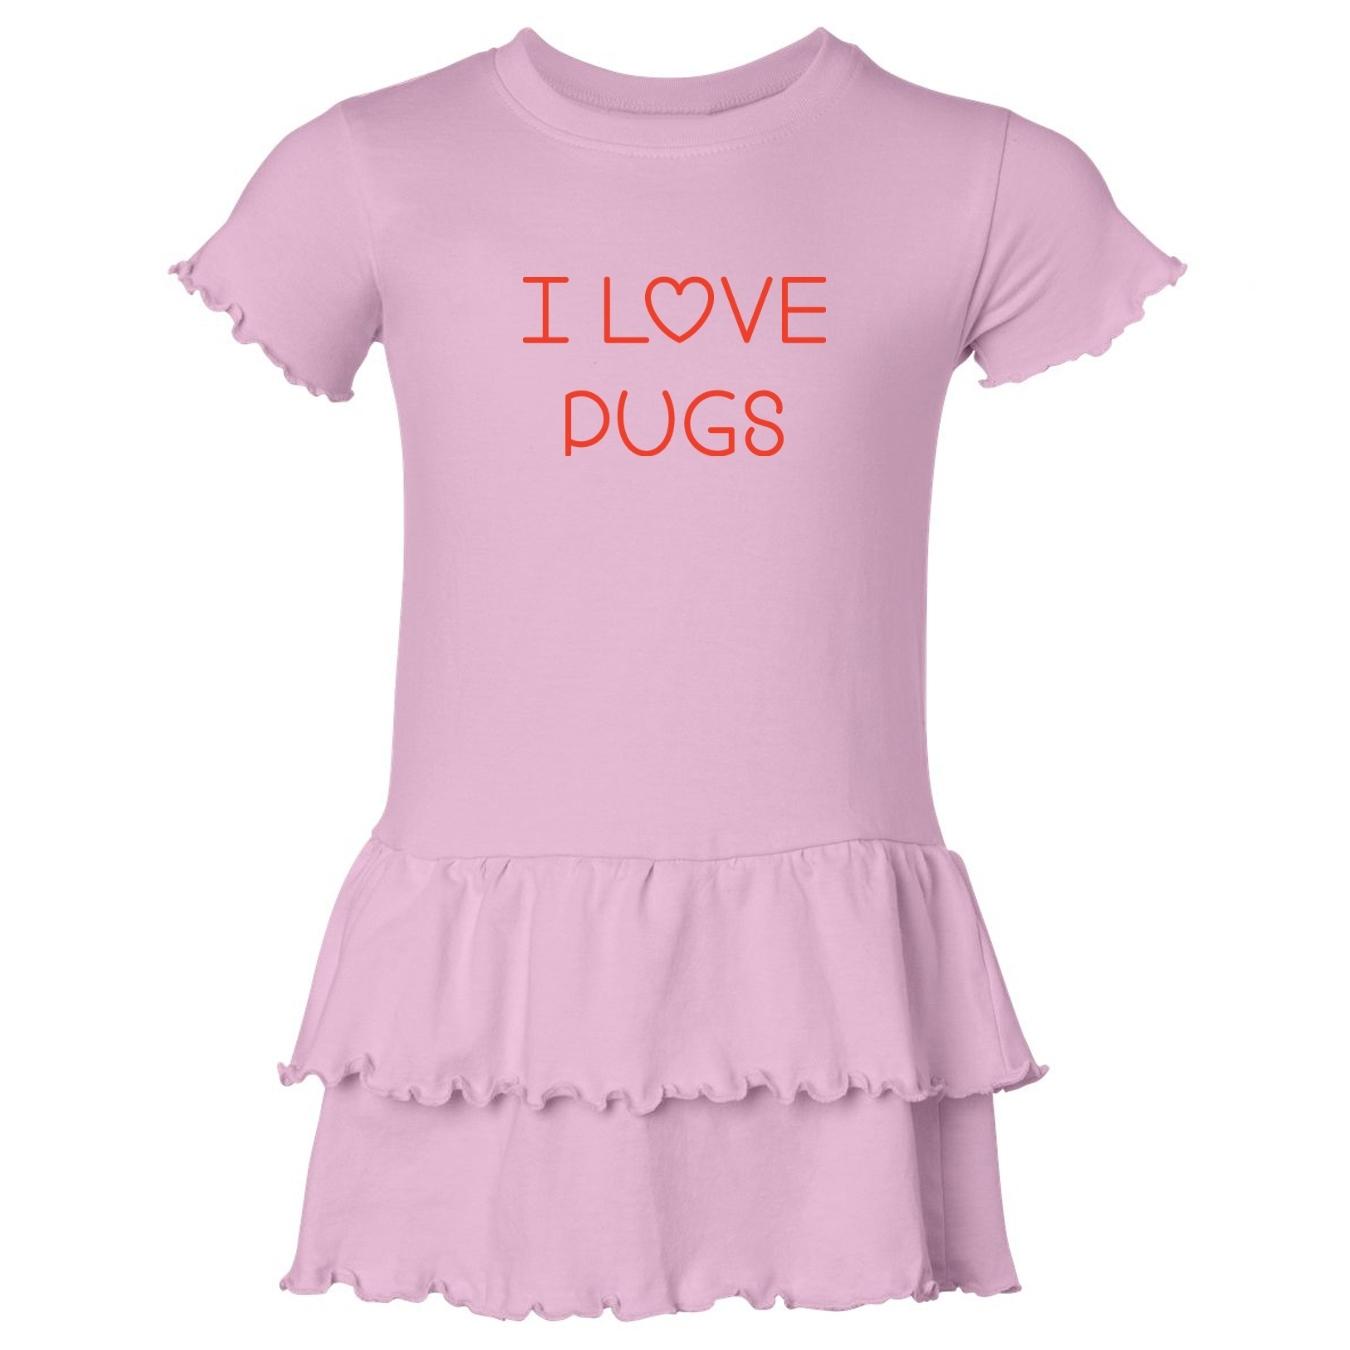 Mashed Clothing I Love Pugs Toddler Ruffle Dress at Sears.com